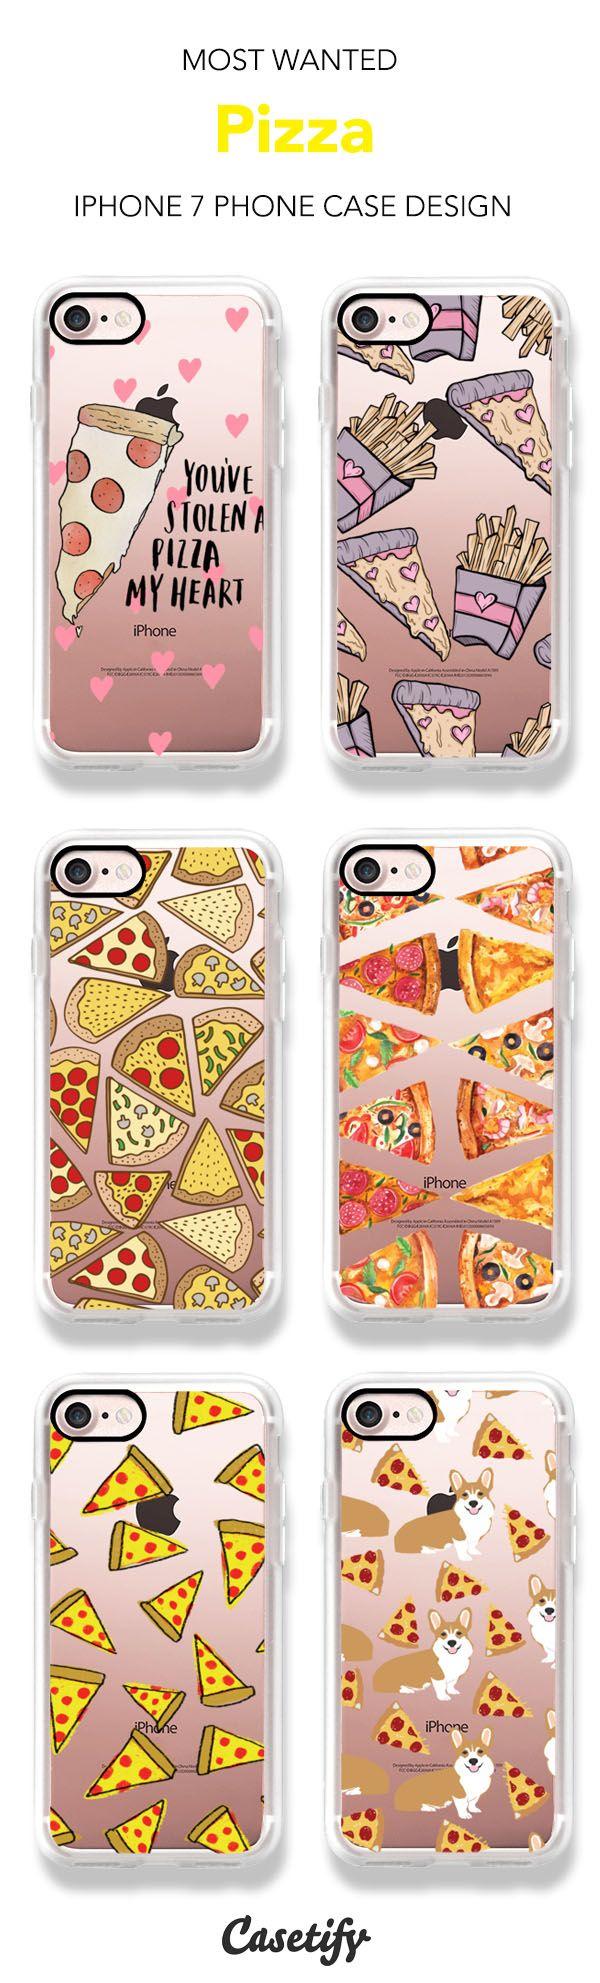 Most Popular Camera iPhone 7 and iPhone 7 Plus case. Shop them all here >   https://www.casetify.com/artworks/qZZPGhNpIw